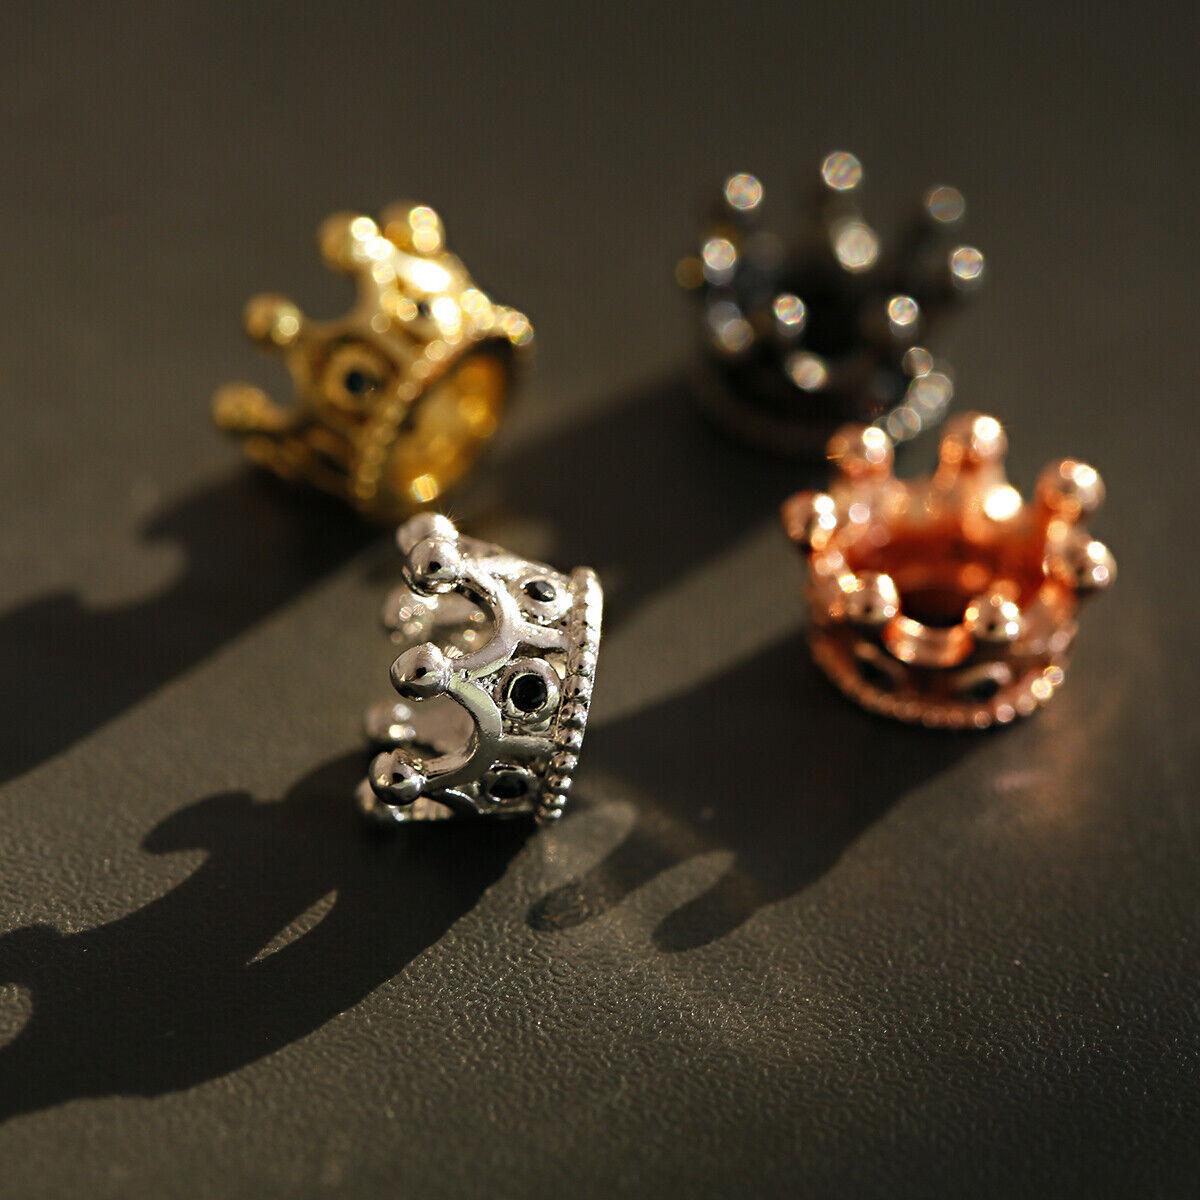 Zircon Gemstones Pave Queen Crown Bracelet Brass Copper Connector Charm Beads 4